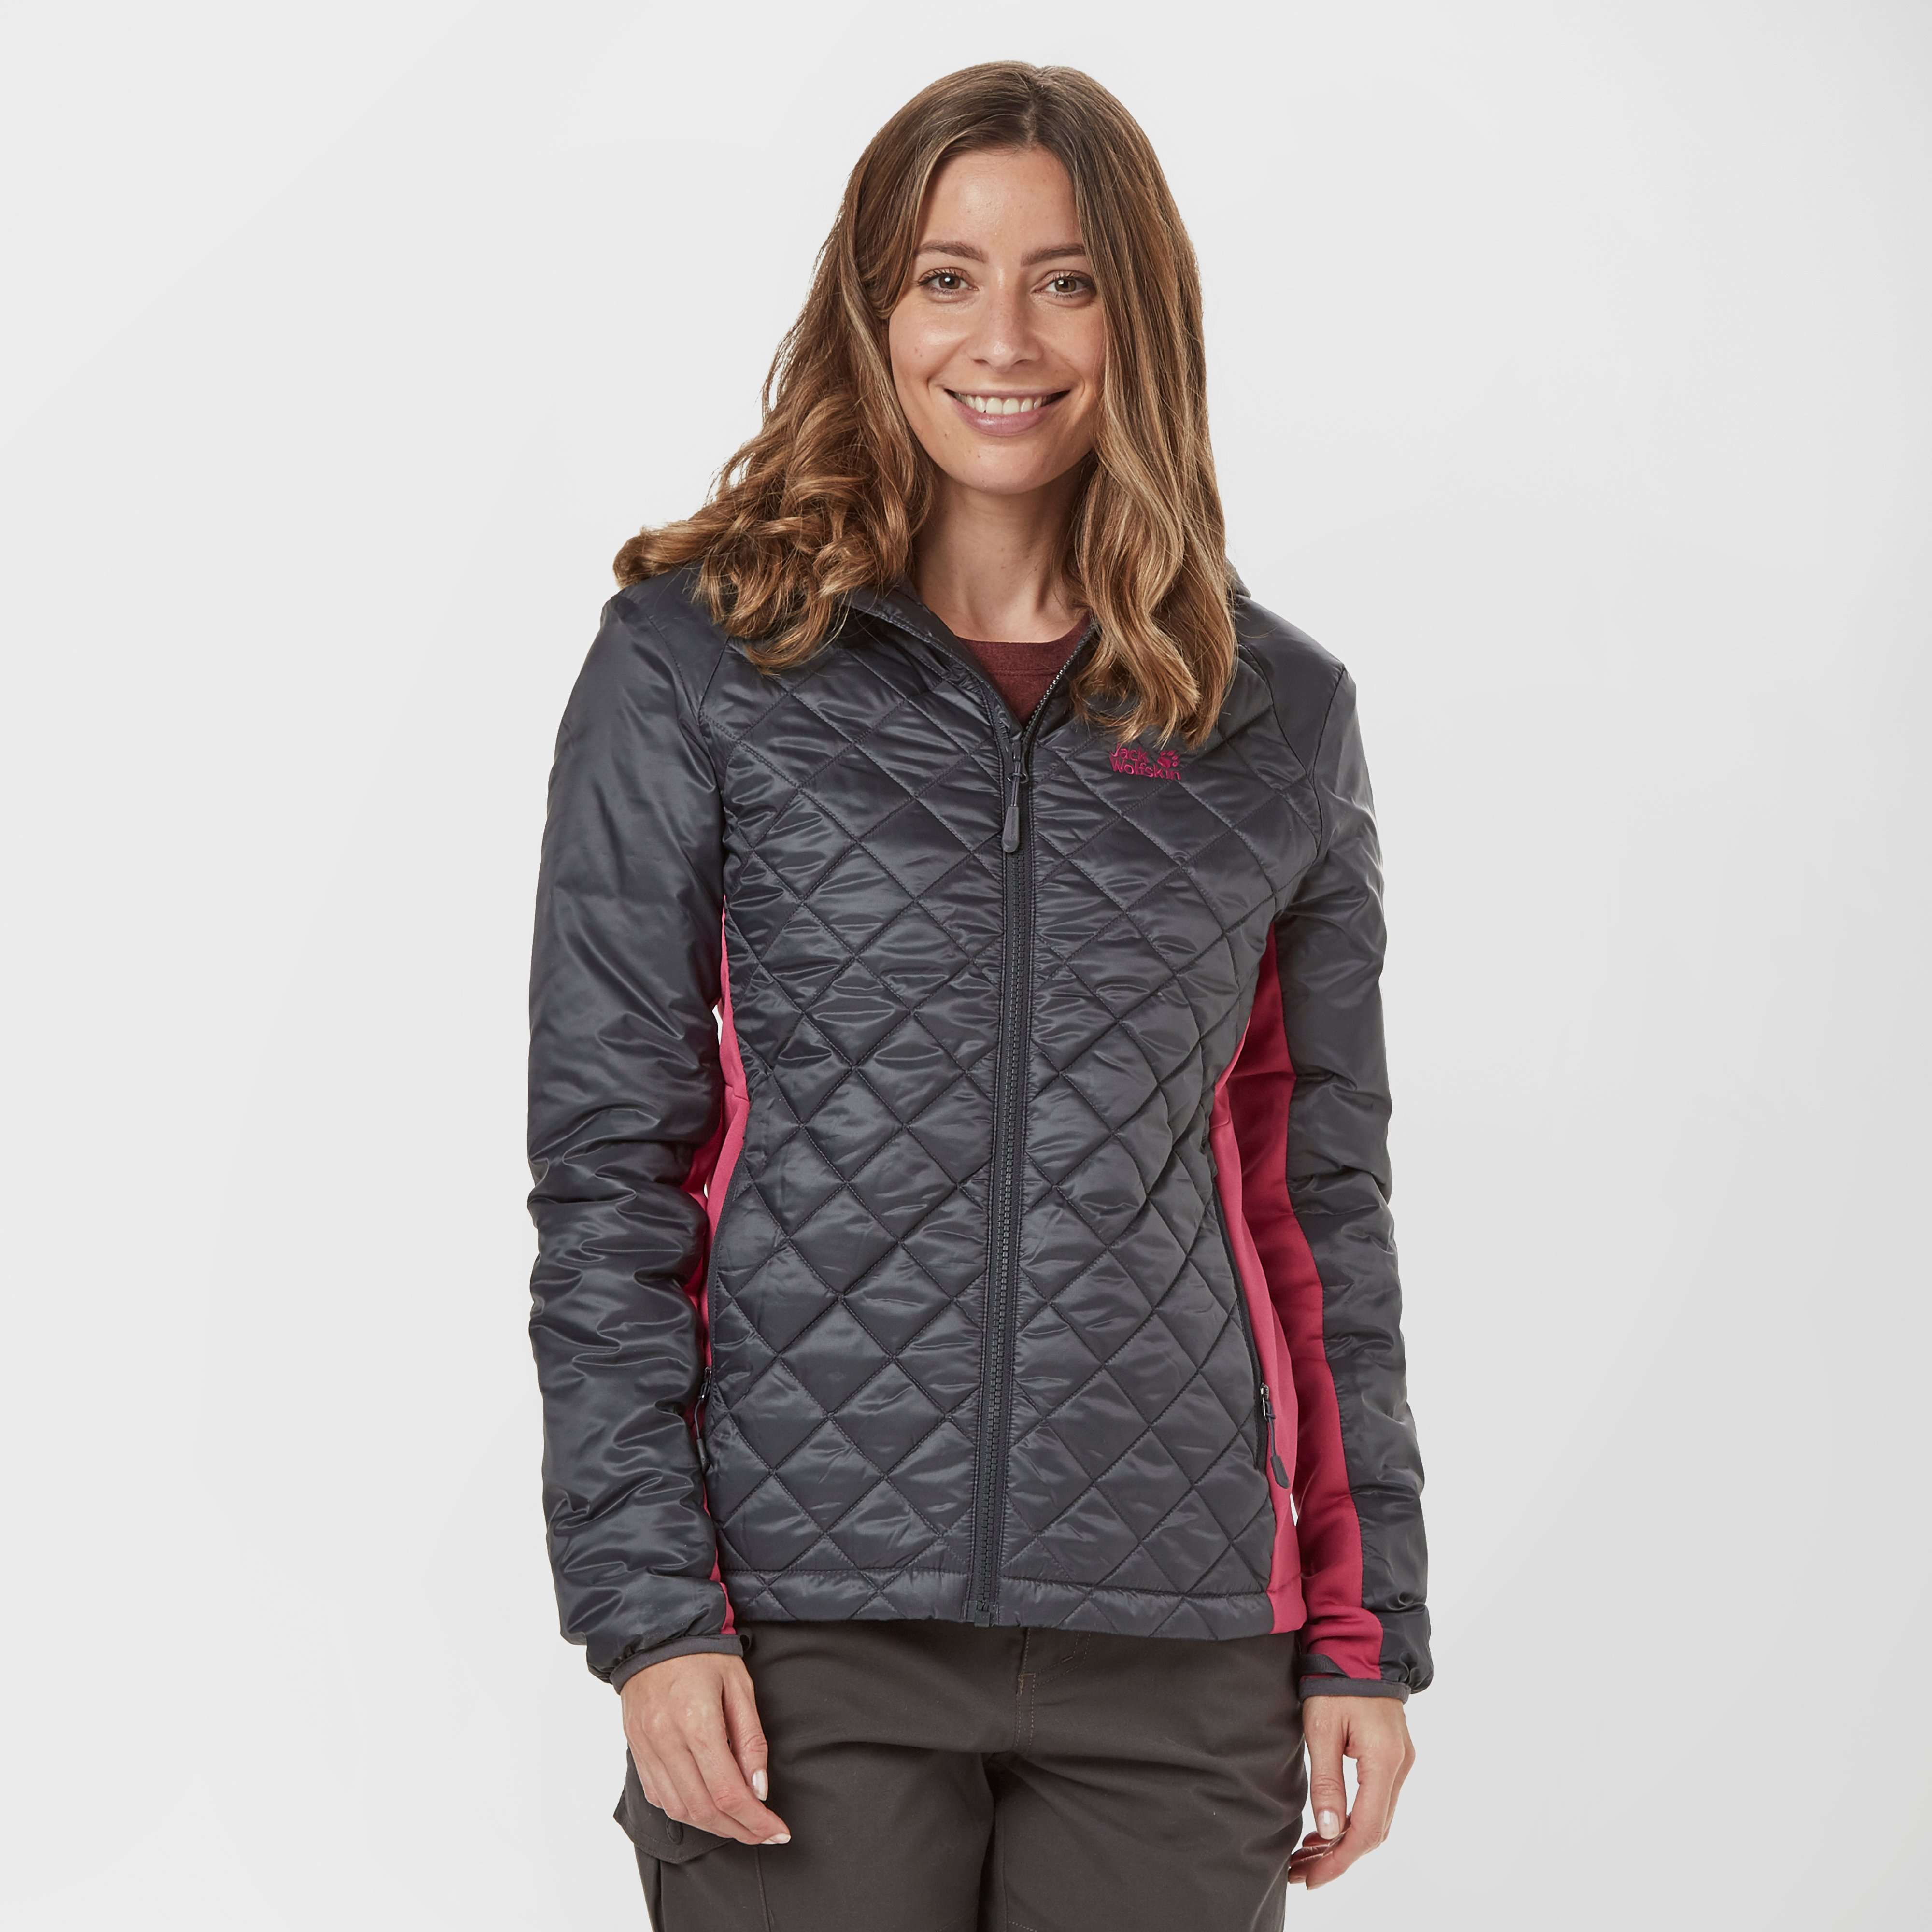 JACK WOLFSKIN Women's Snowy Tundra Jacket